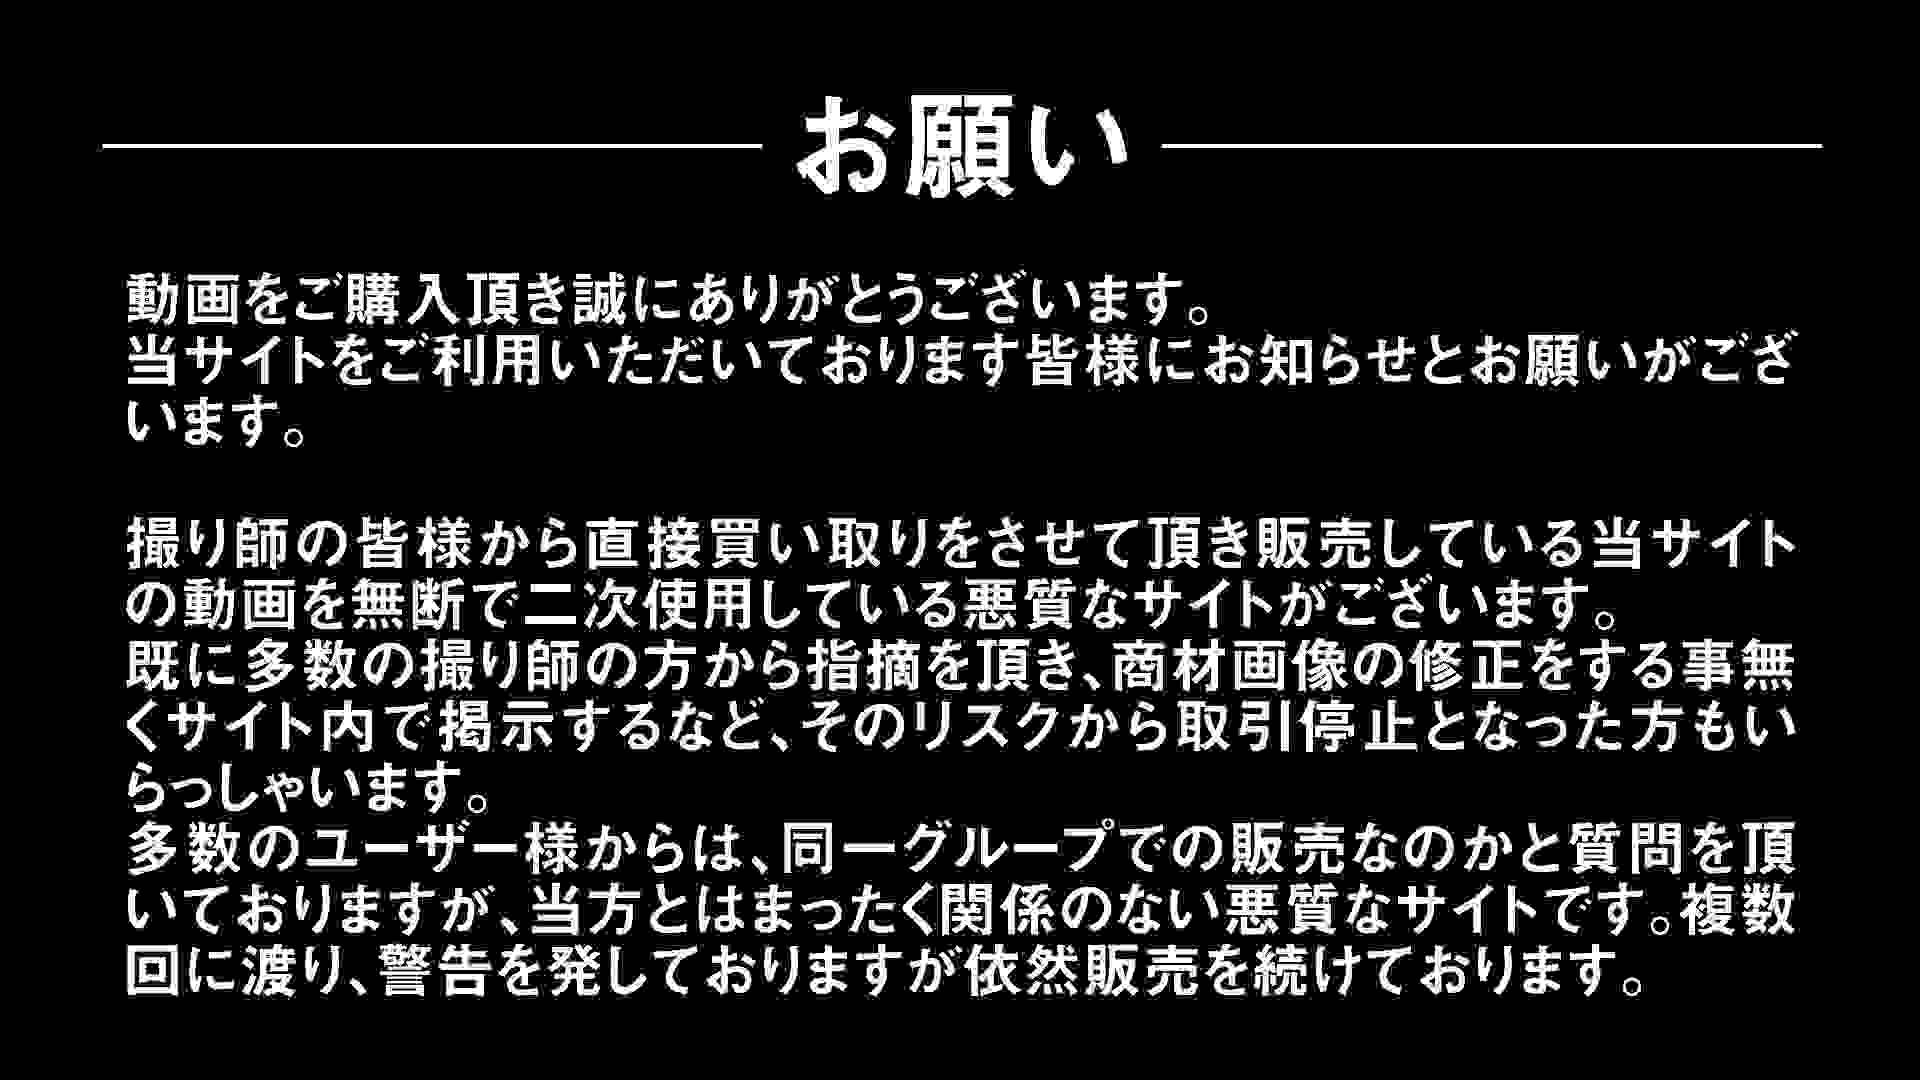 Aquaな露天風呂Vol.294 露天 セックス無修正動画無料 75画像 20